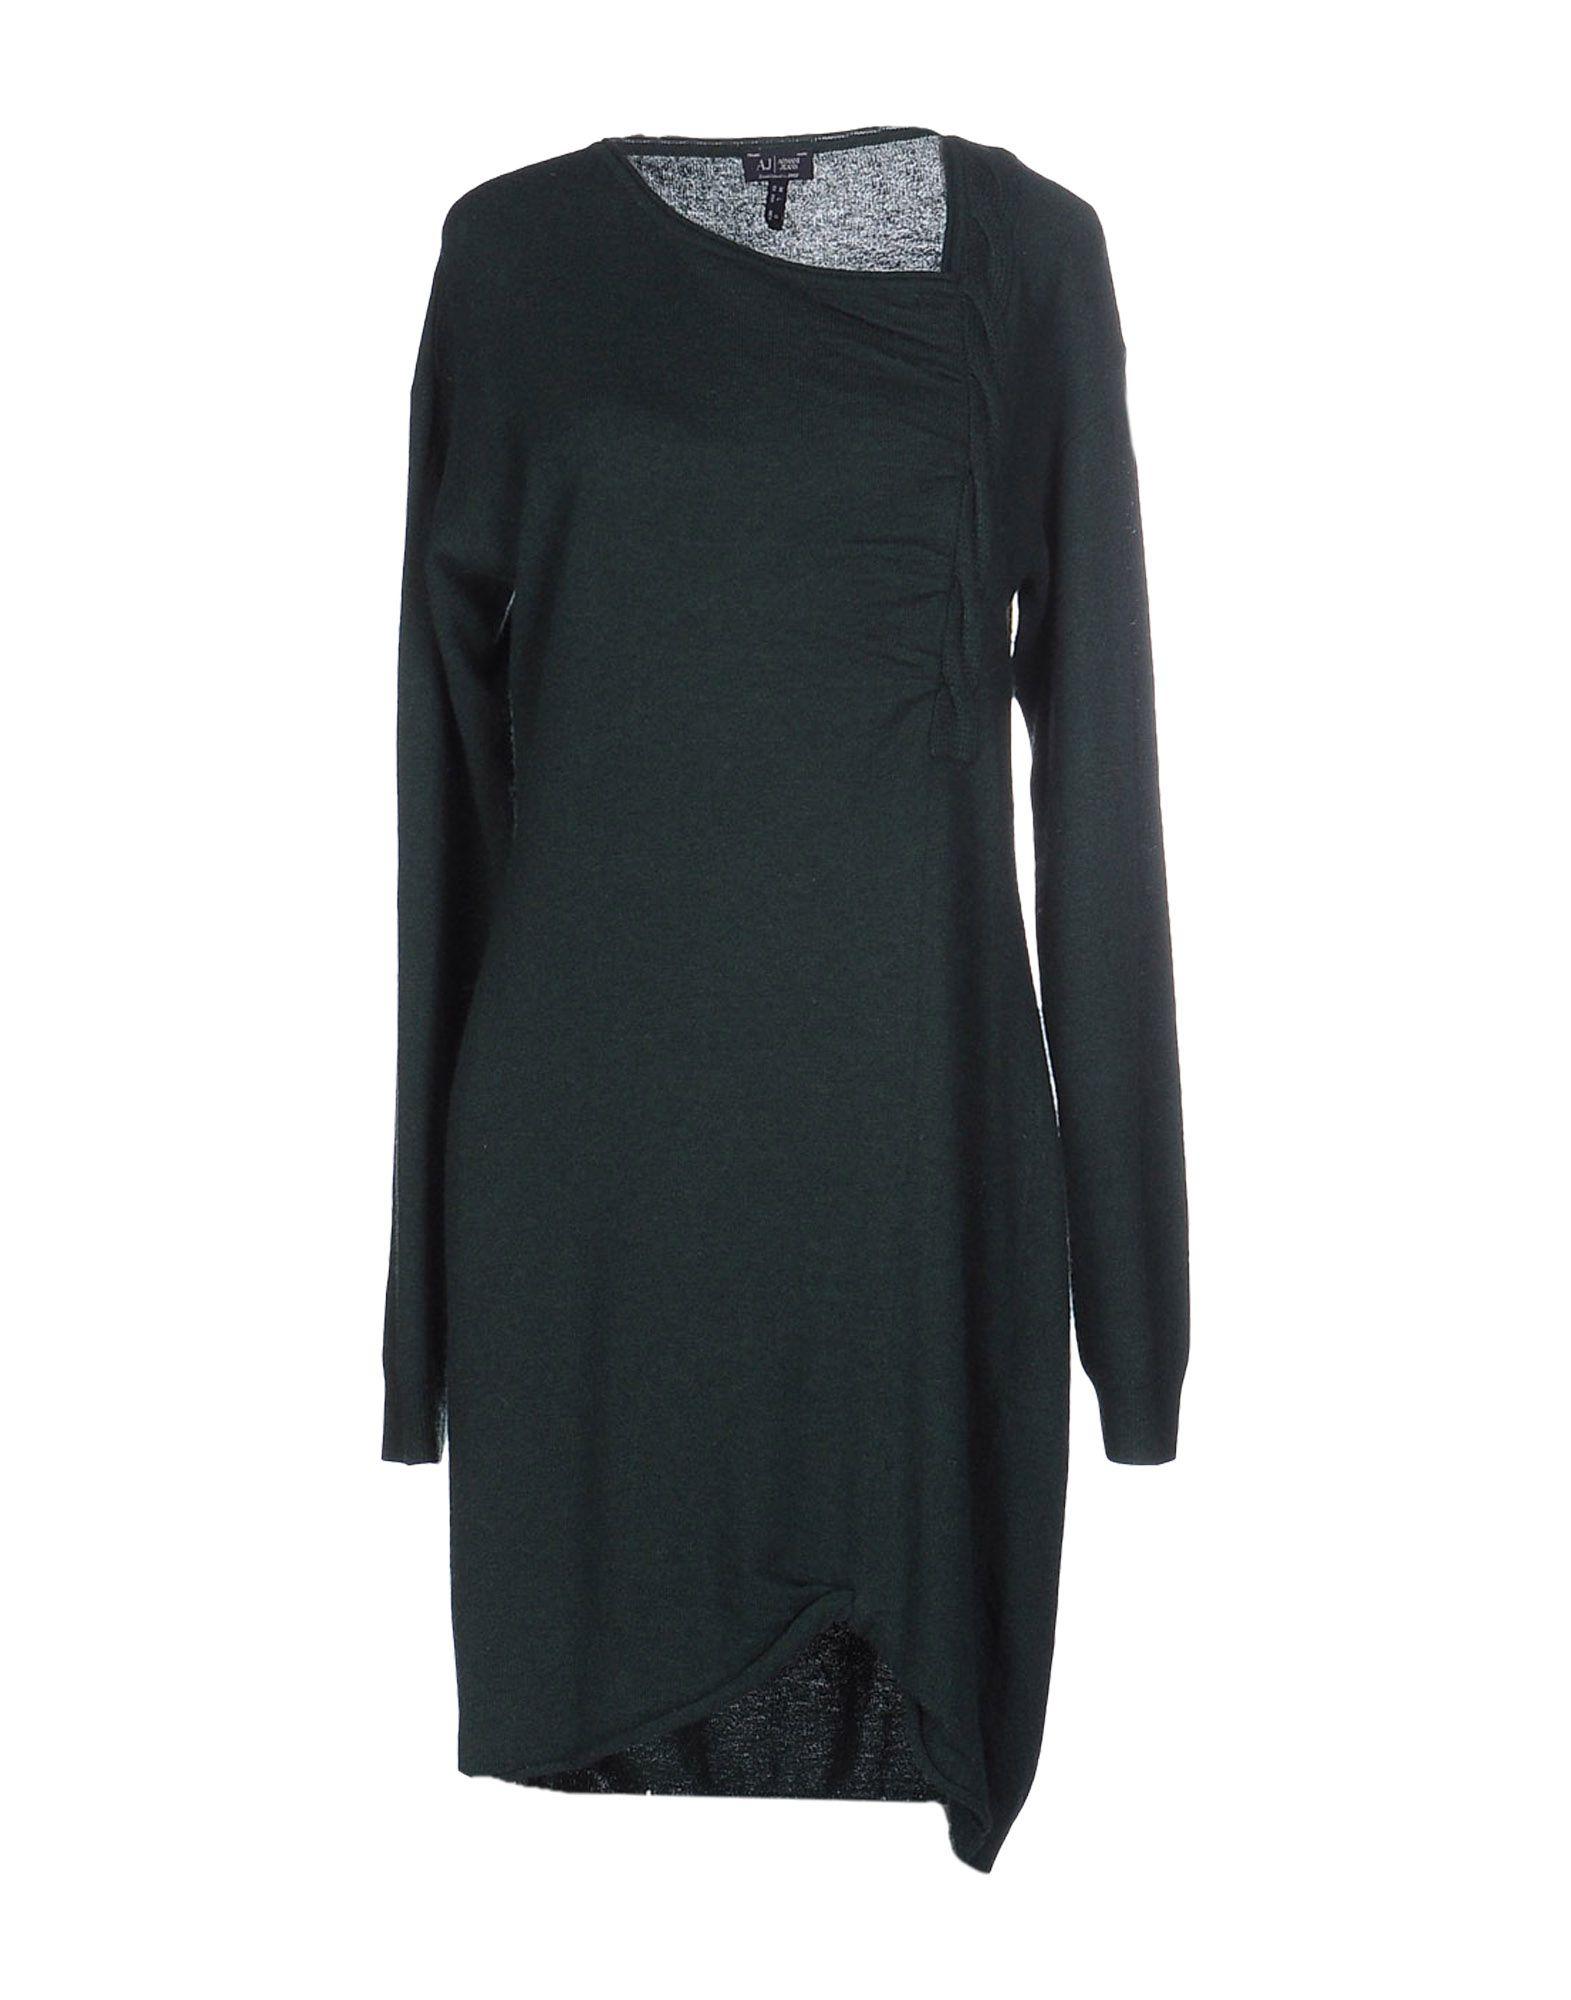 ARMANI JEANS Короткое платье платье armani jeans 6y5a11 5n2bz 1200